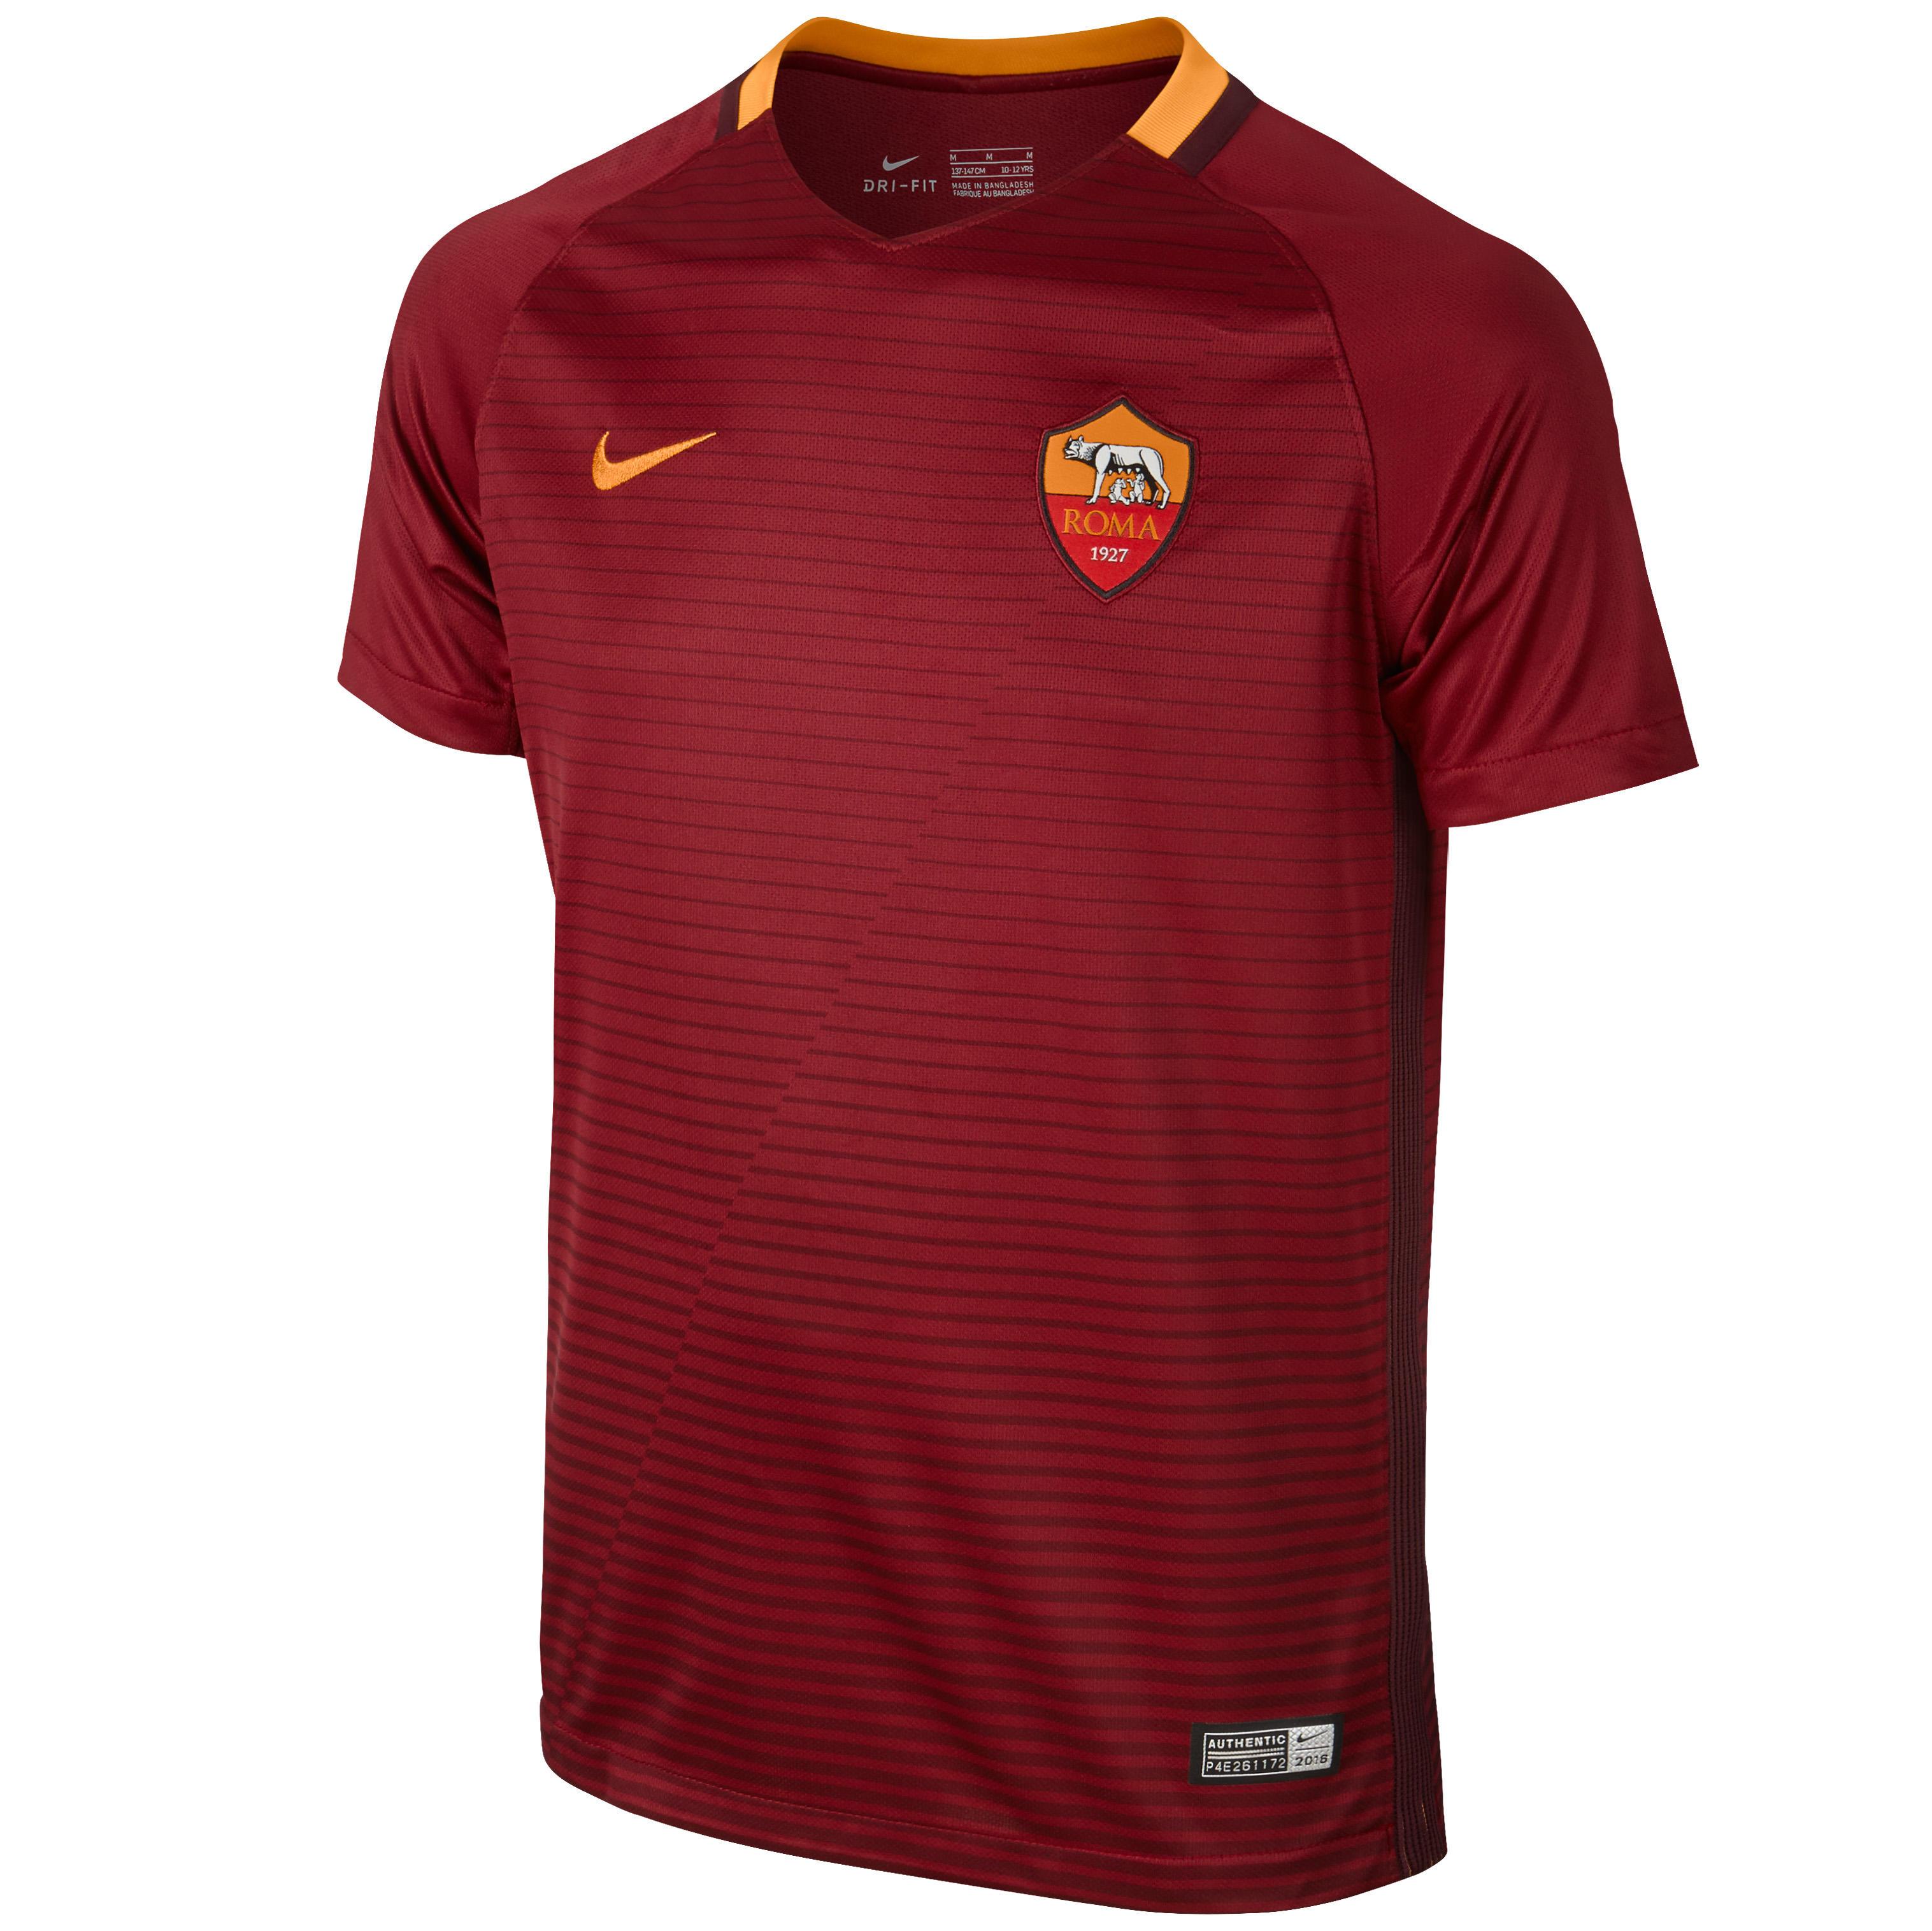 Nike Voetbalshirt AS Roma thuisshirt voor volwassenen rood